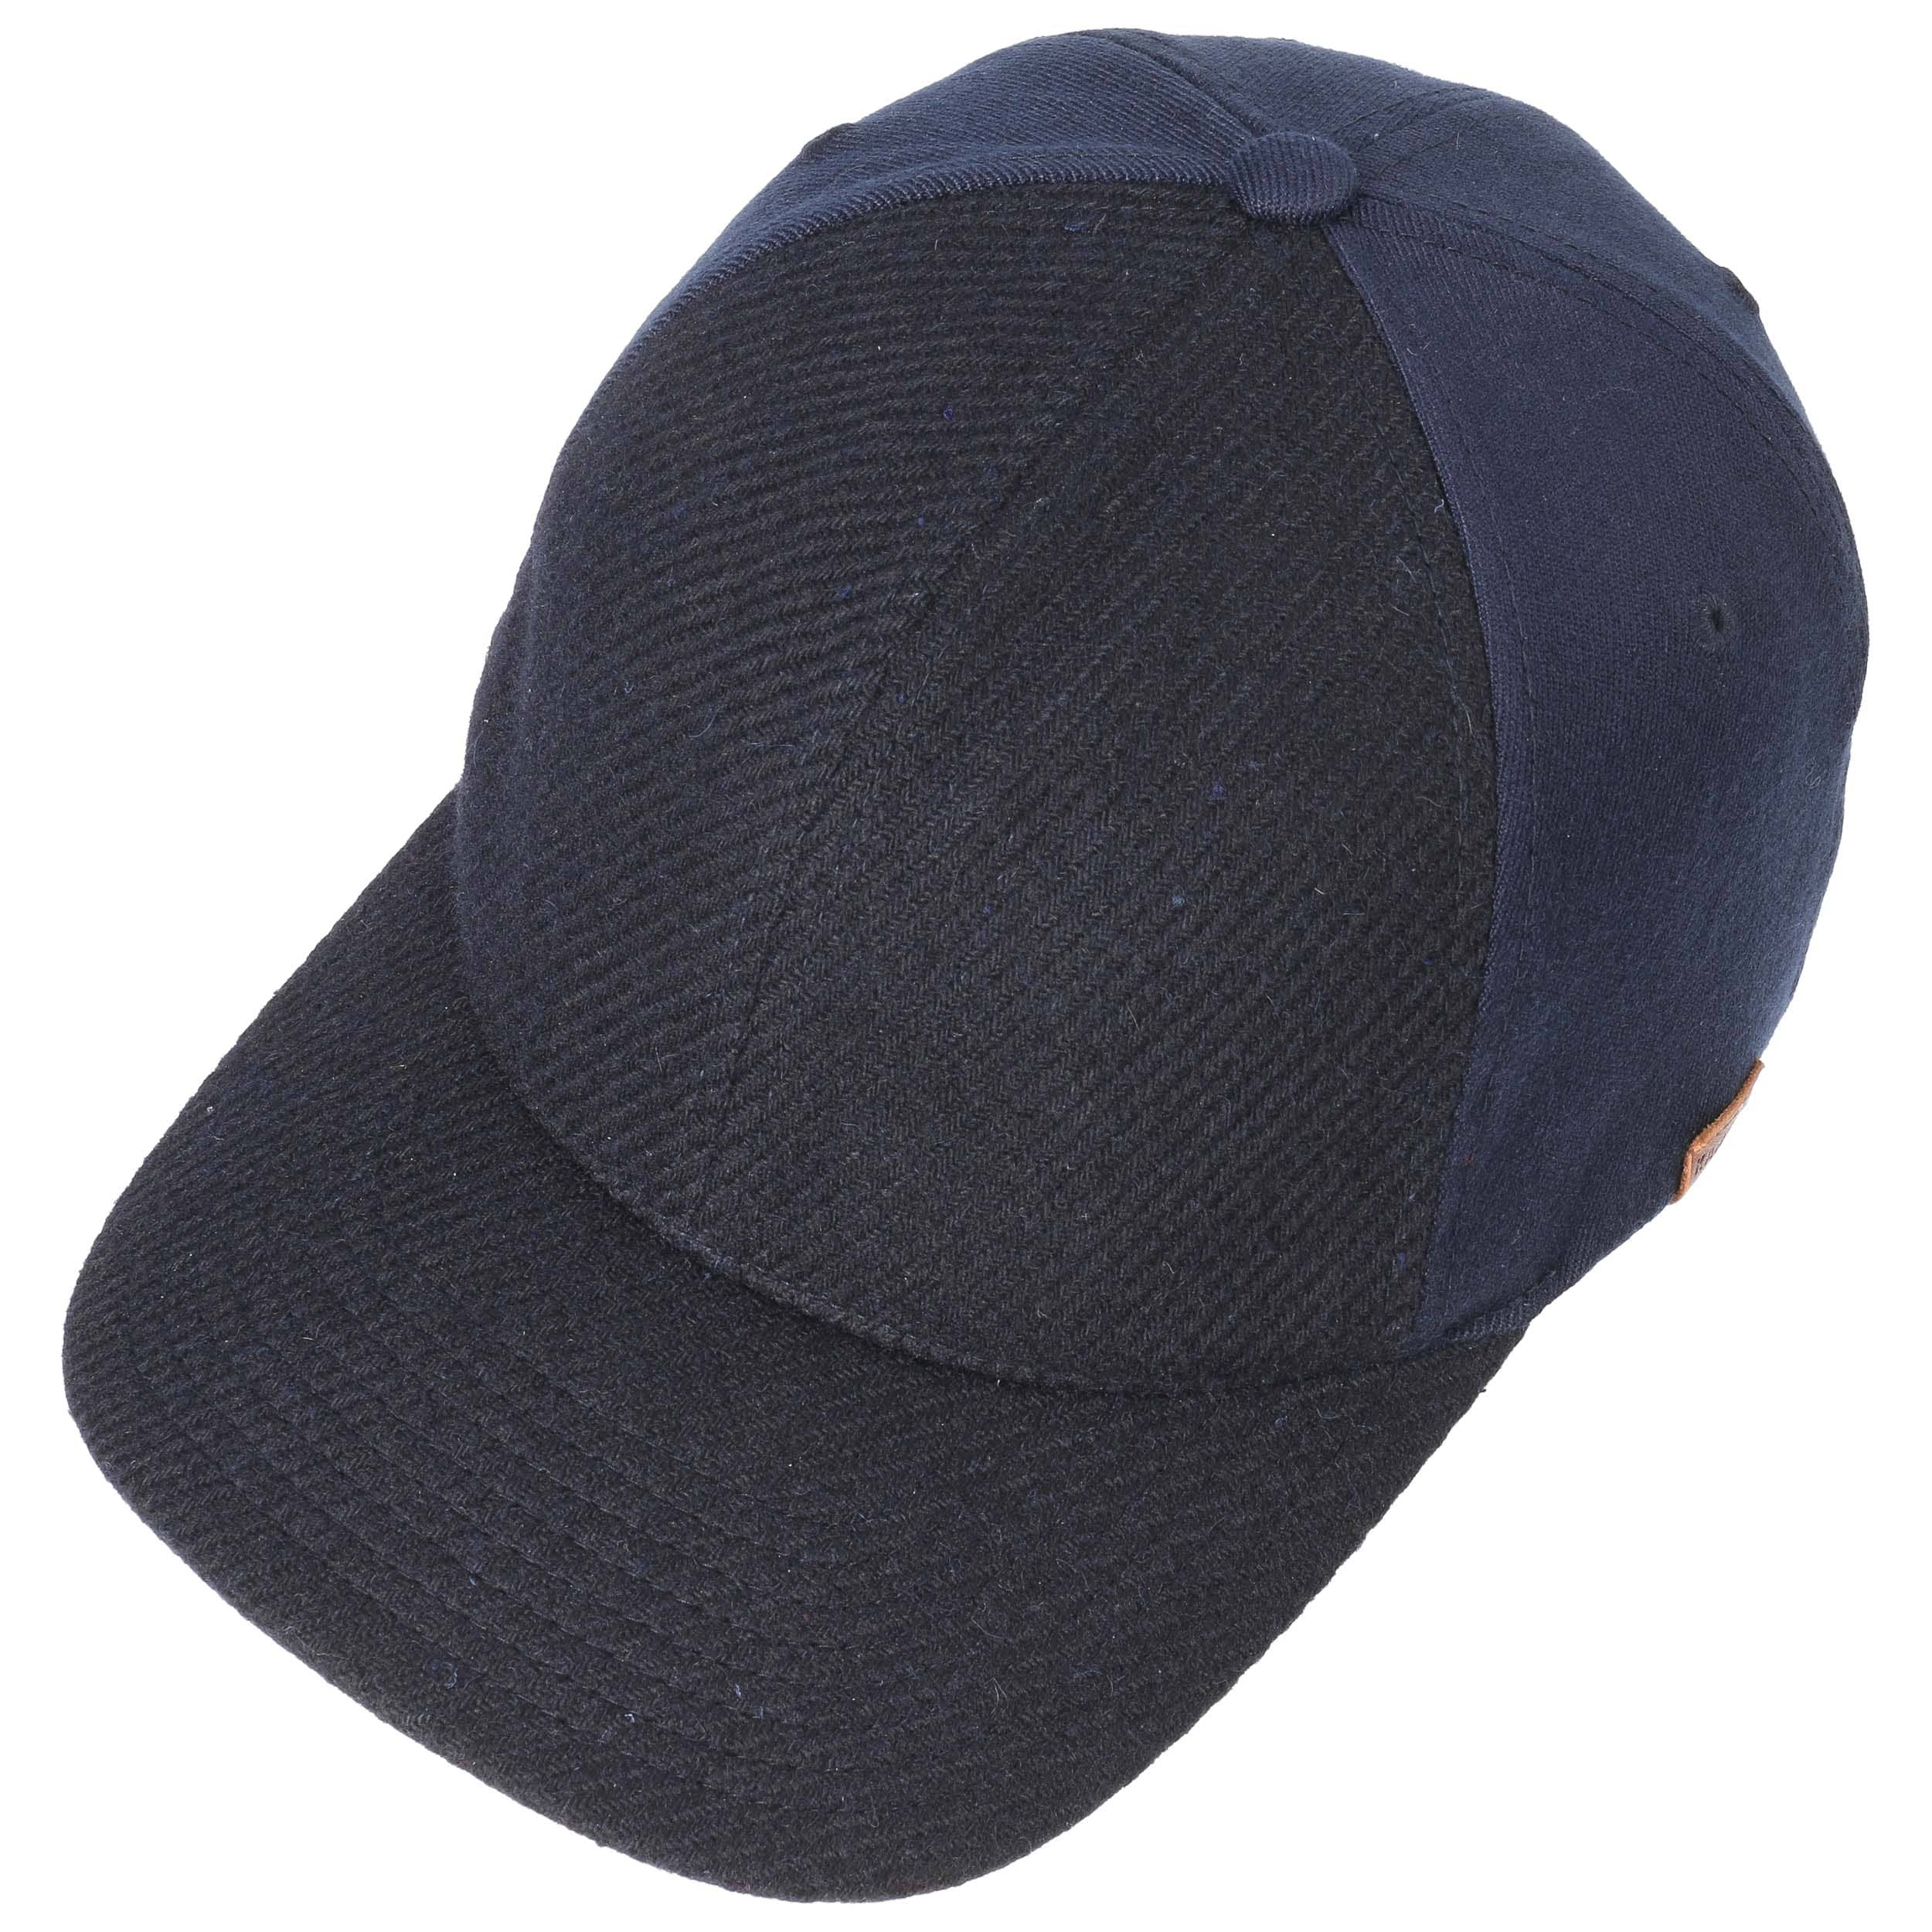 ... Textured Wool Flexfit Cap by Kangol - grey 2 ... ff5c83943383